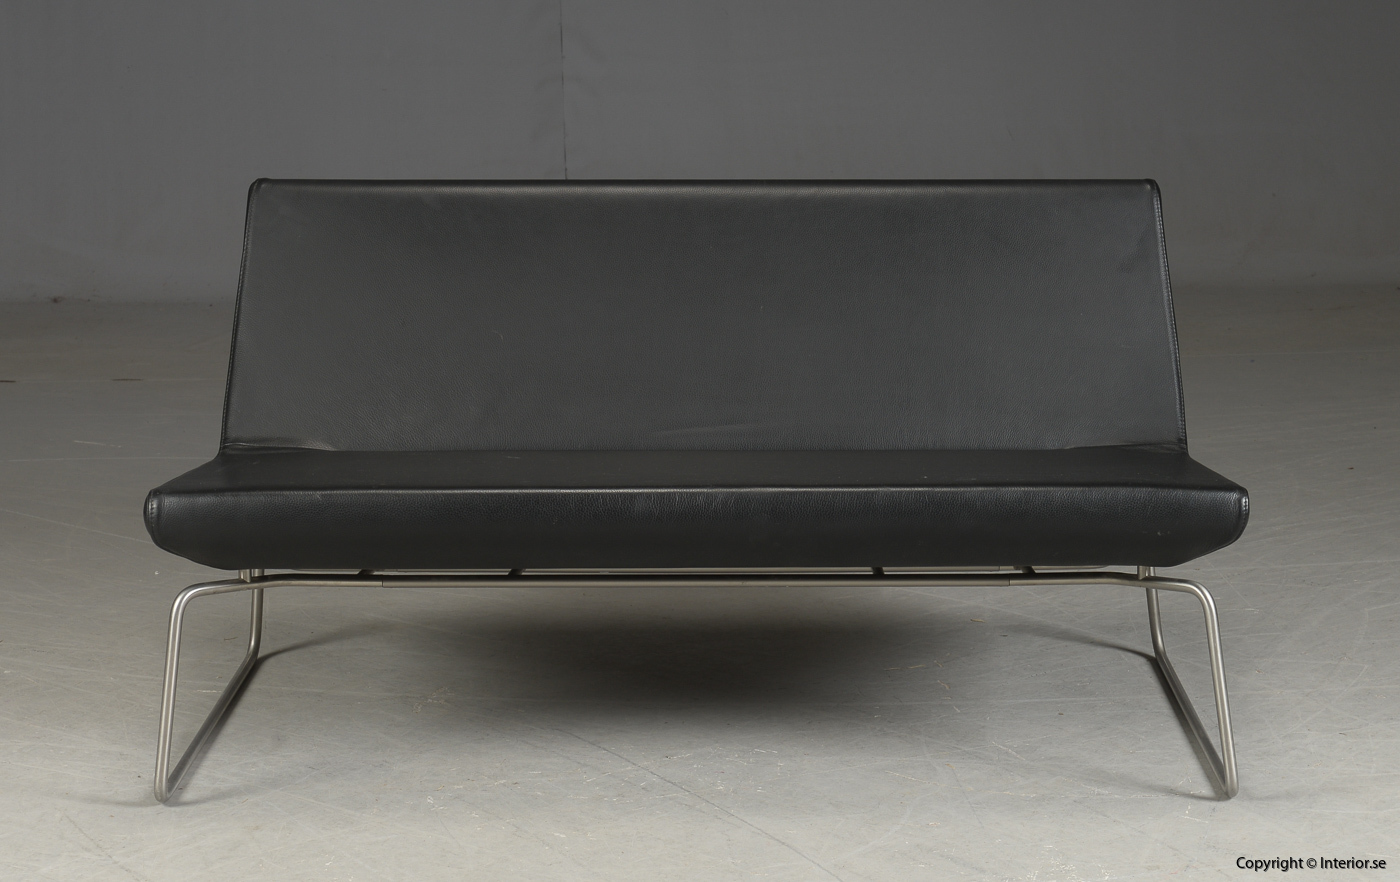 Soffa, Cappellini Superlight Sofa - Barber Osgerby 2